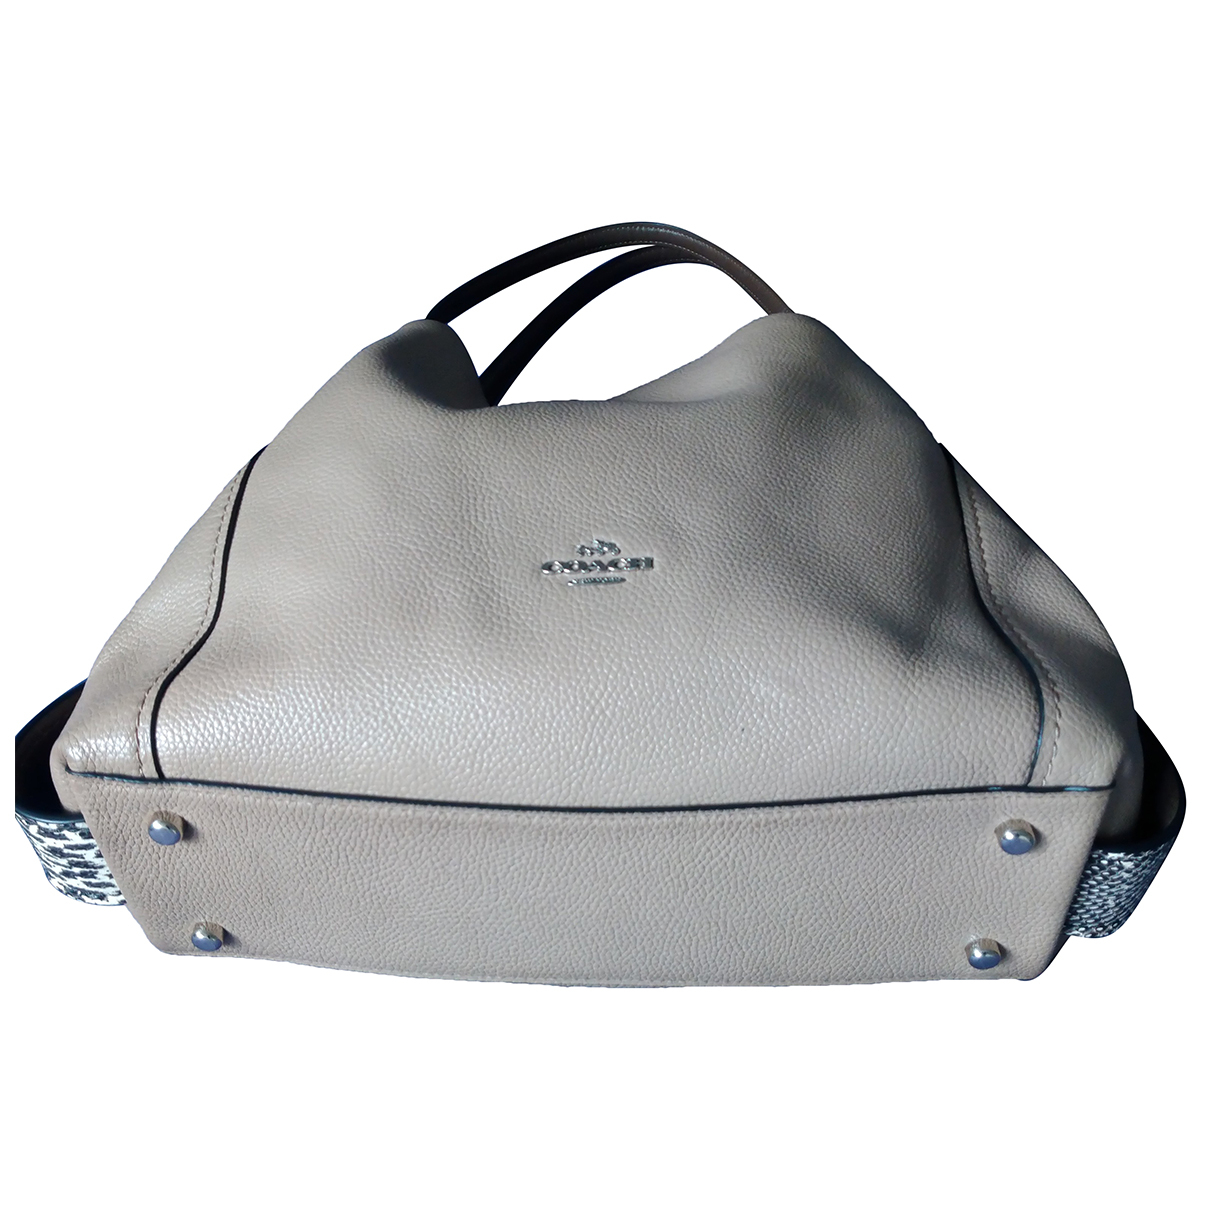 Coach Edie Beige Leather handbag for Women N